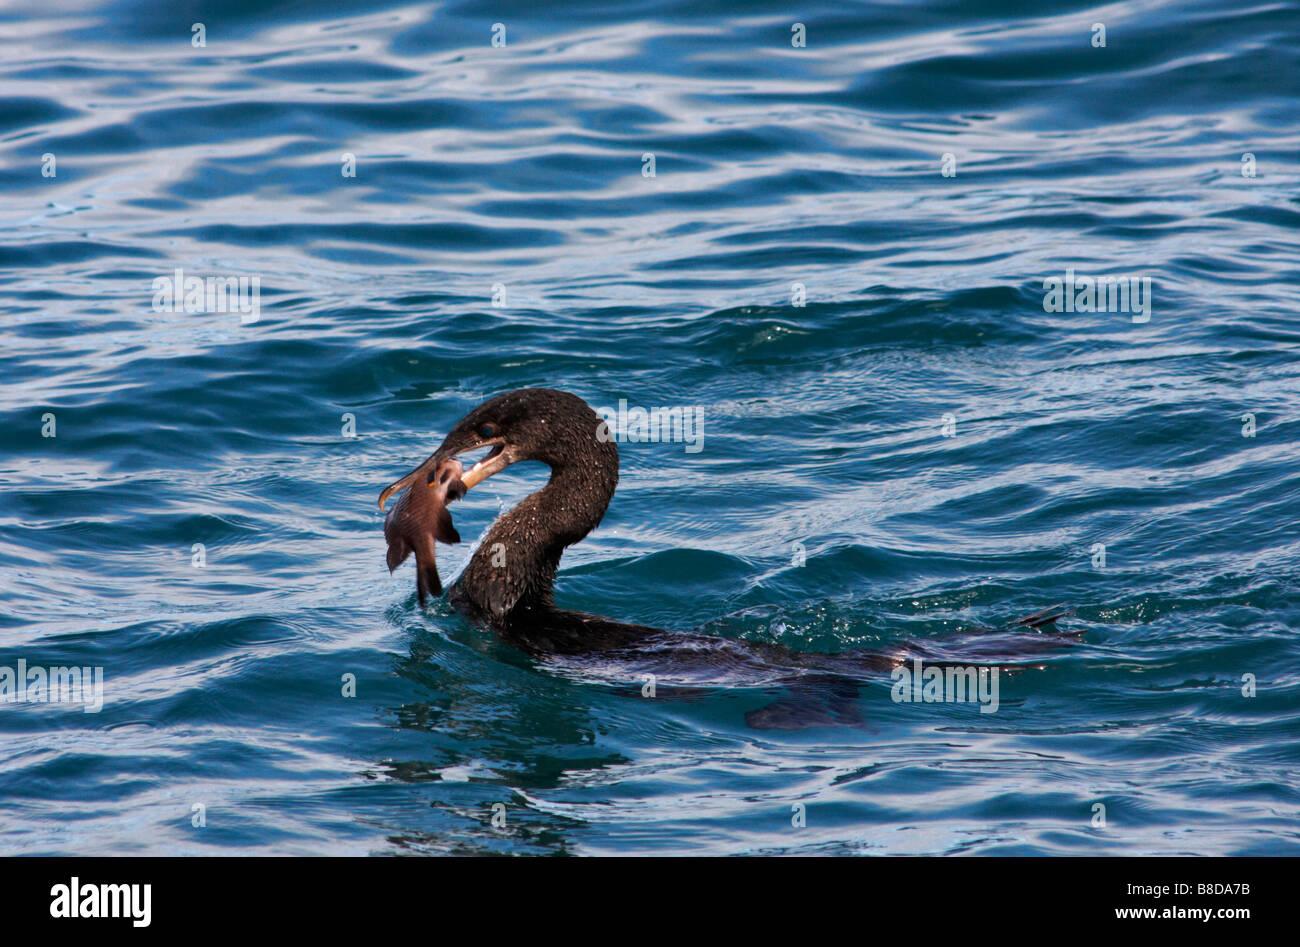 Galapagos Flightless cormorant, Nannopterum harrisi, with fish in bill at Isabela Island, Galapagos Islands, Ecuador - Stock Image